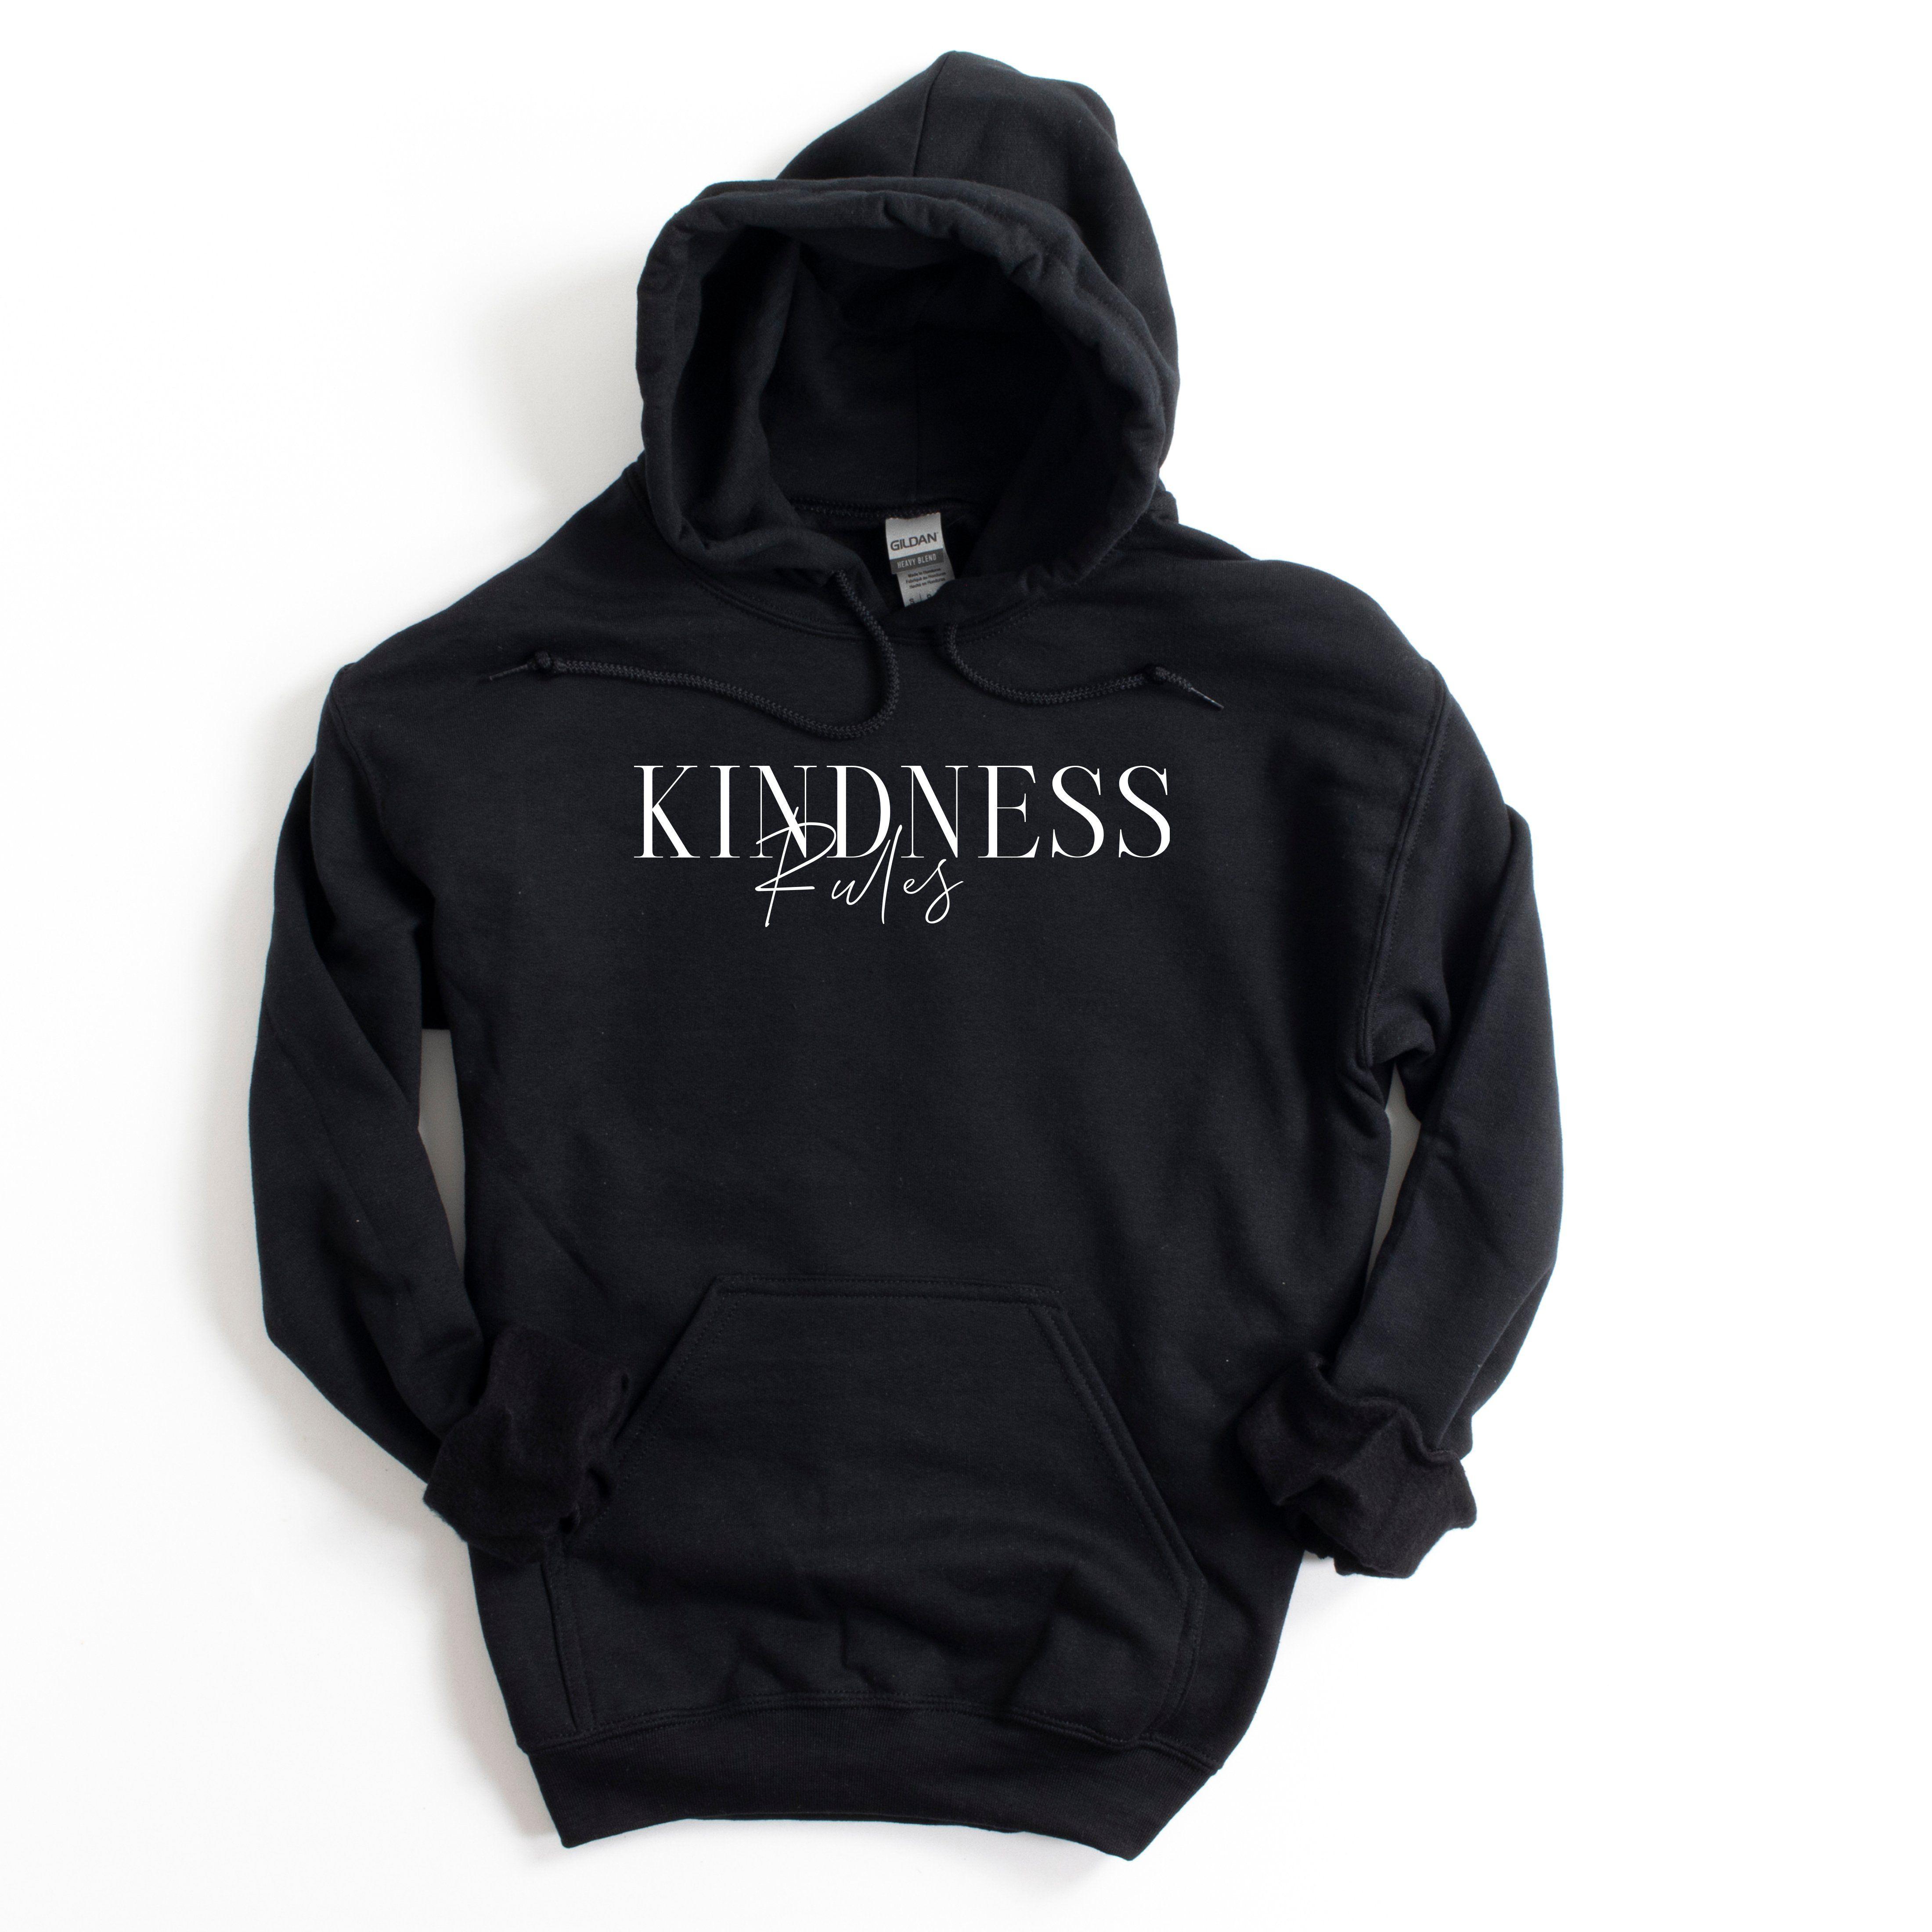 Kindness Rules Hoodie Sweatshirt - Black / S